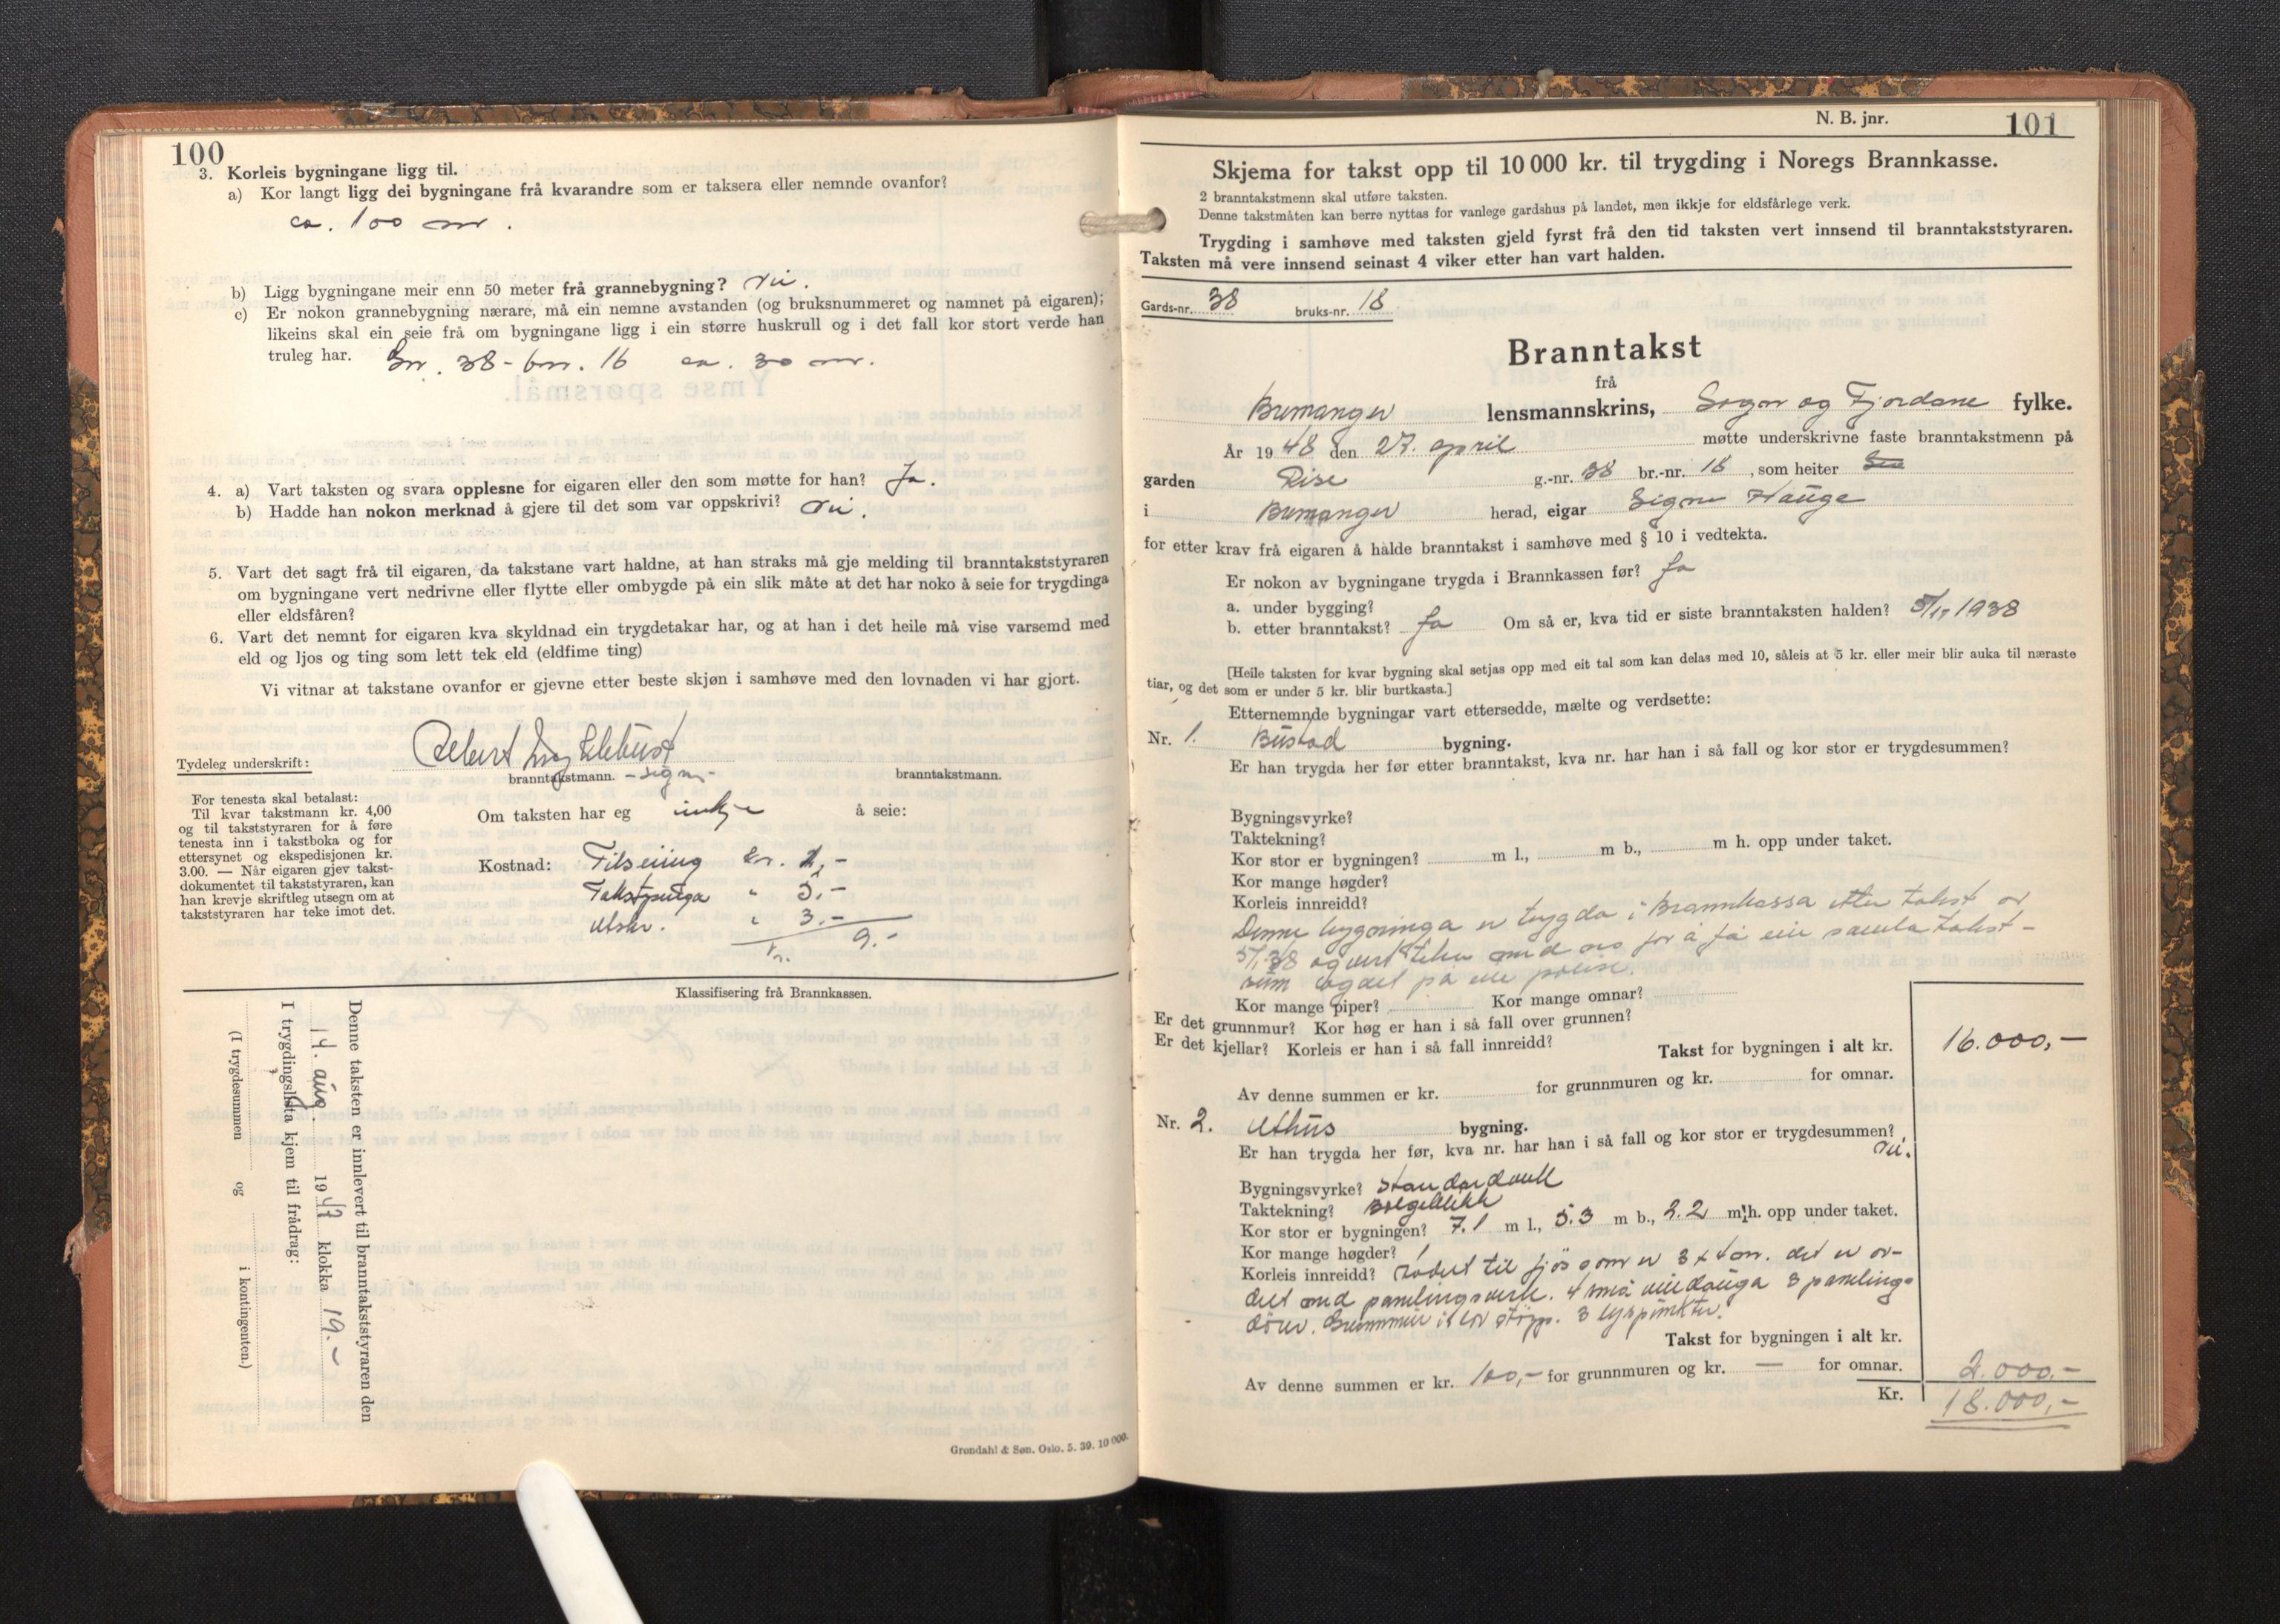 SAB, Lensmannen i Bremanger, 0012/L0009: Branntakstprotokoll, skjematakst, 1943-1950, p. 100-101